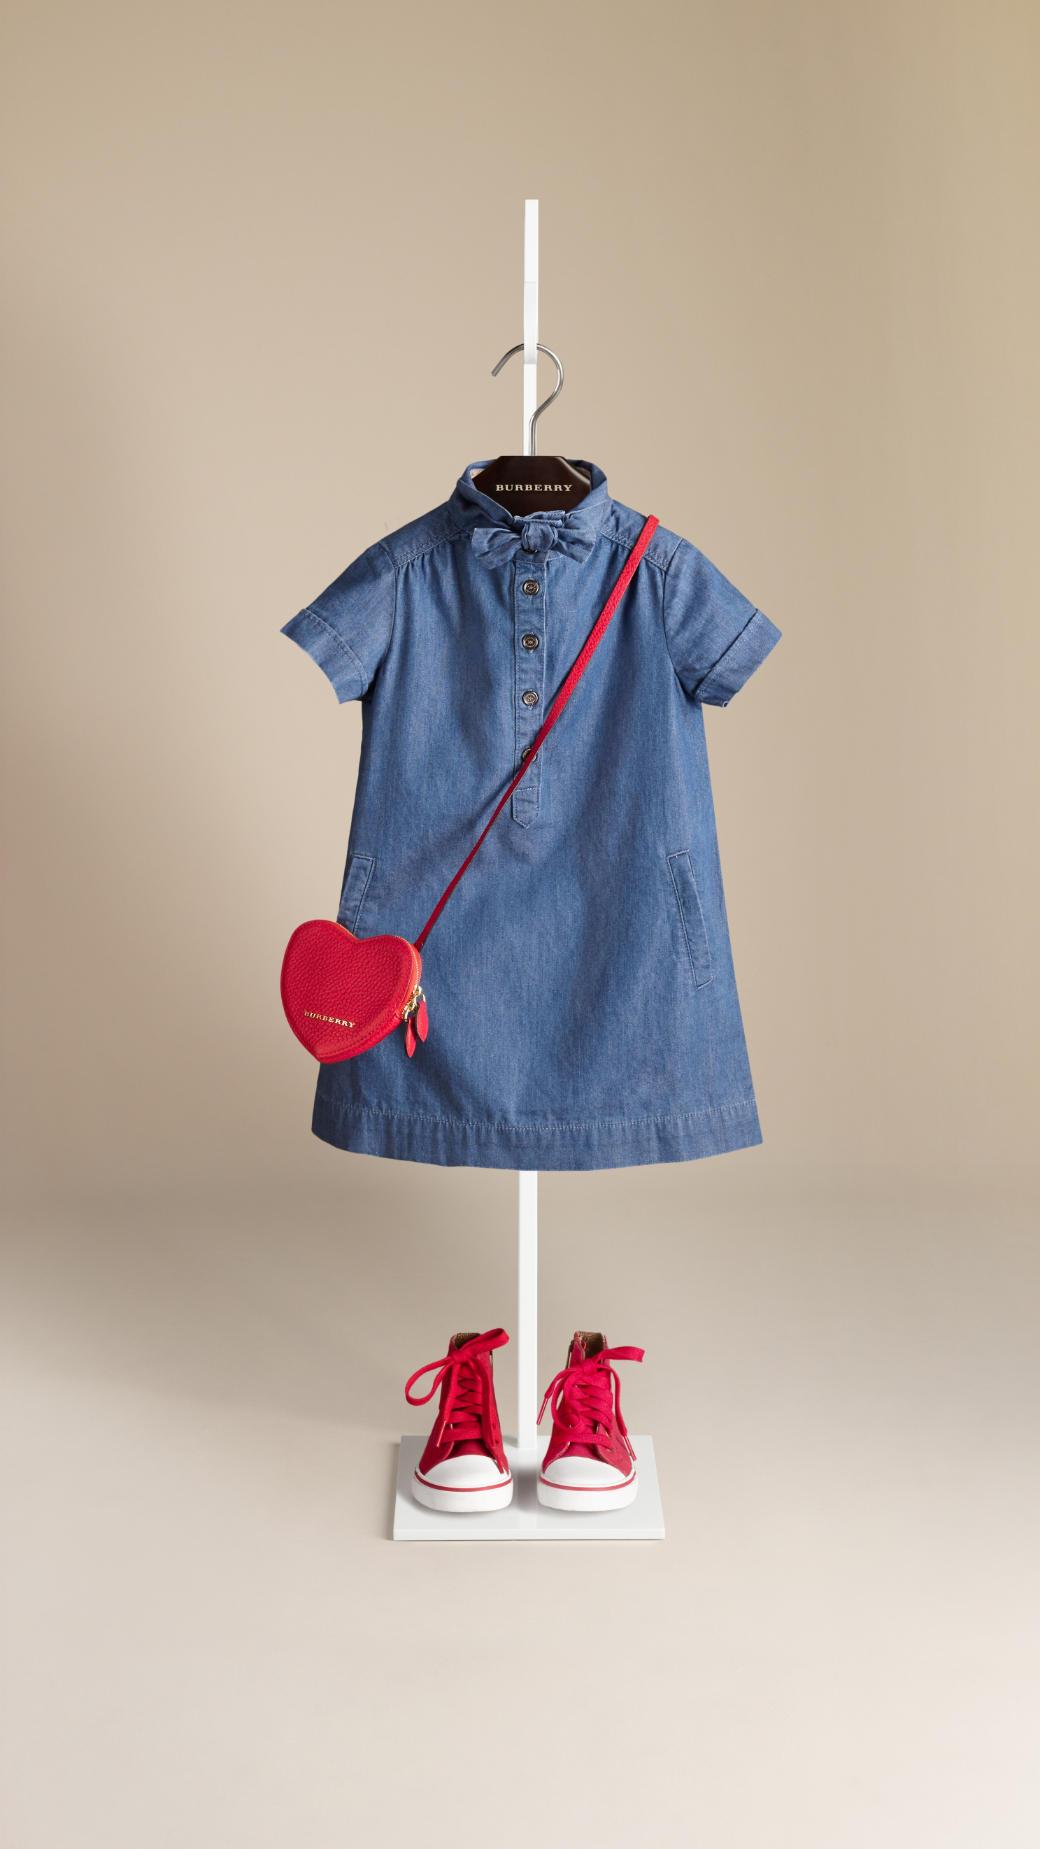 Burberry childrenswear British elegance for spring summer 2014